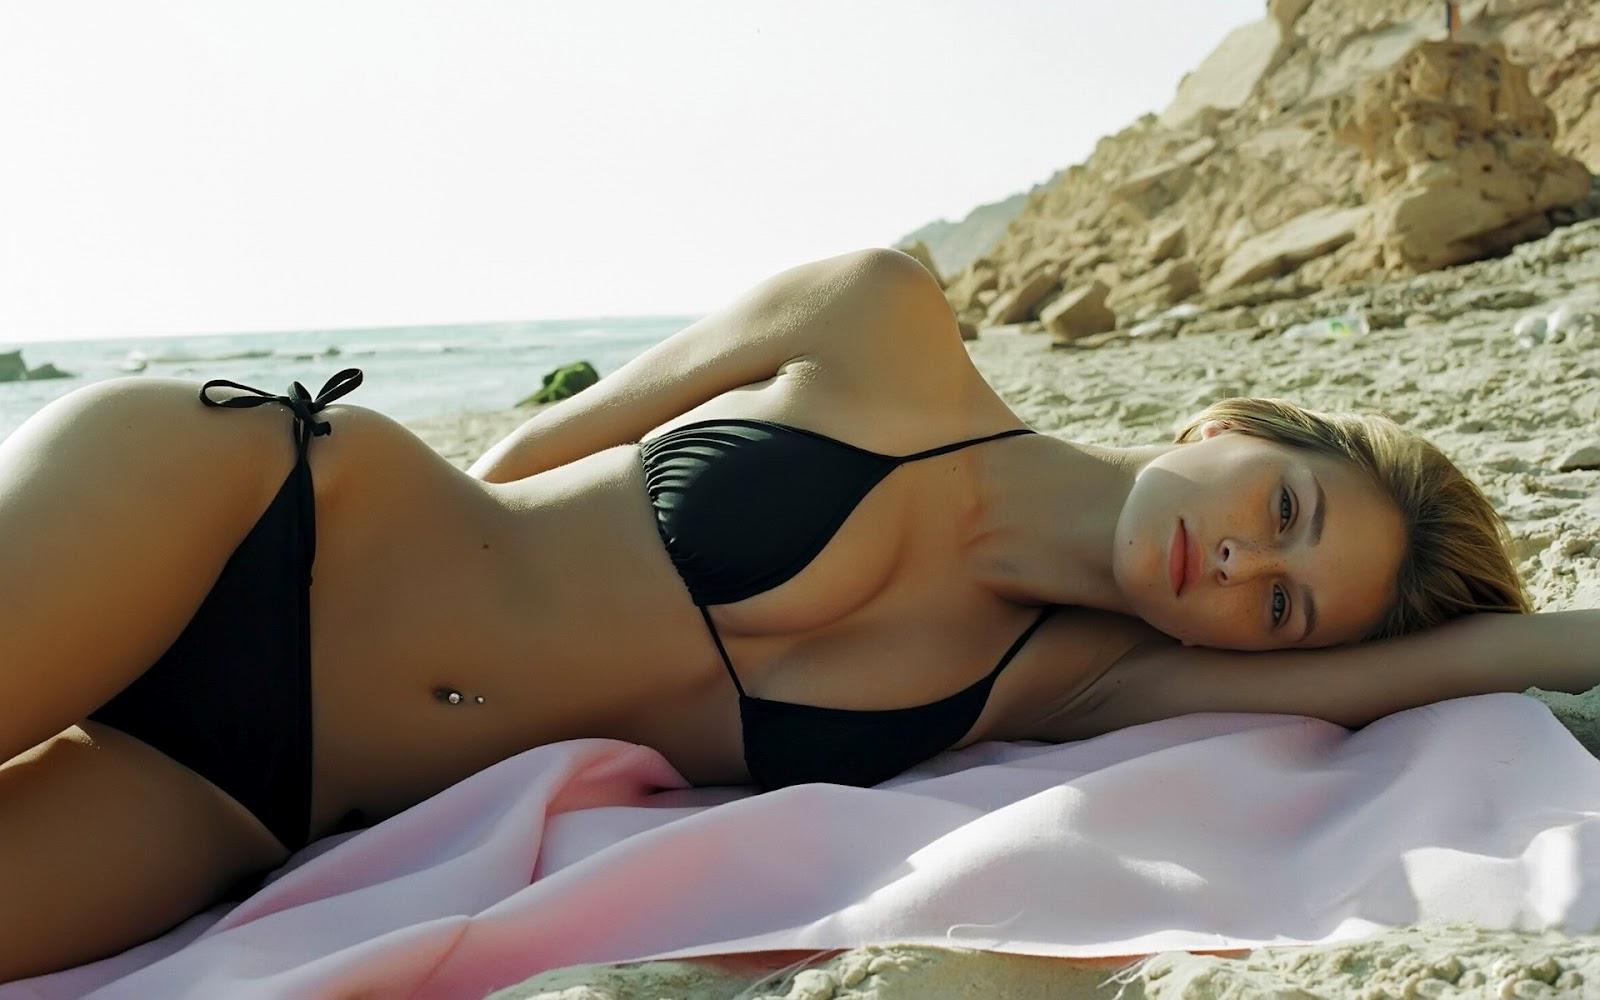 Bar Refaeli Photo Bikini, Part 2 - Klikmax-5740